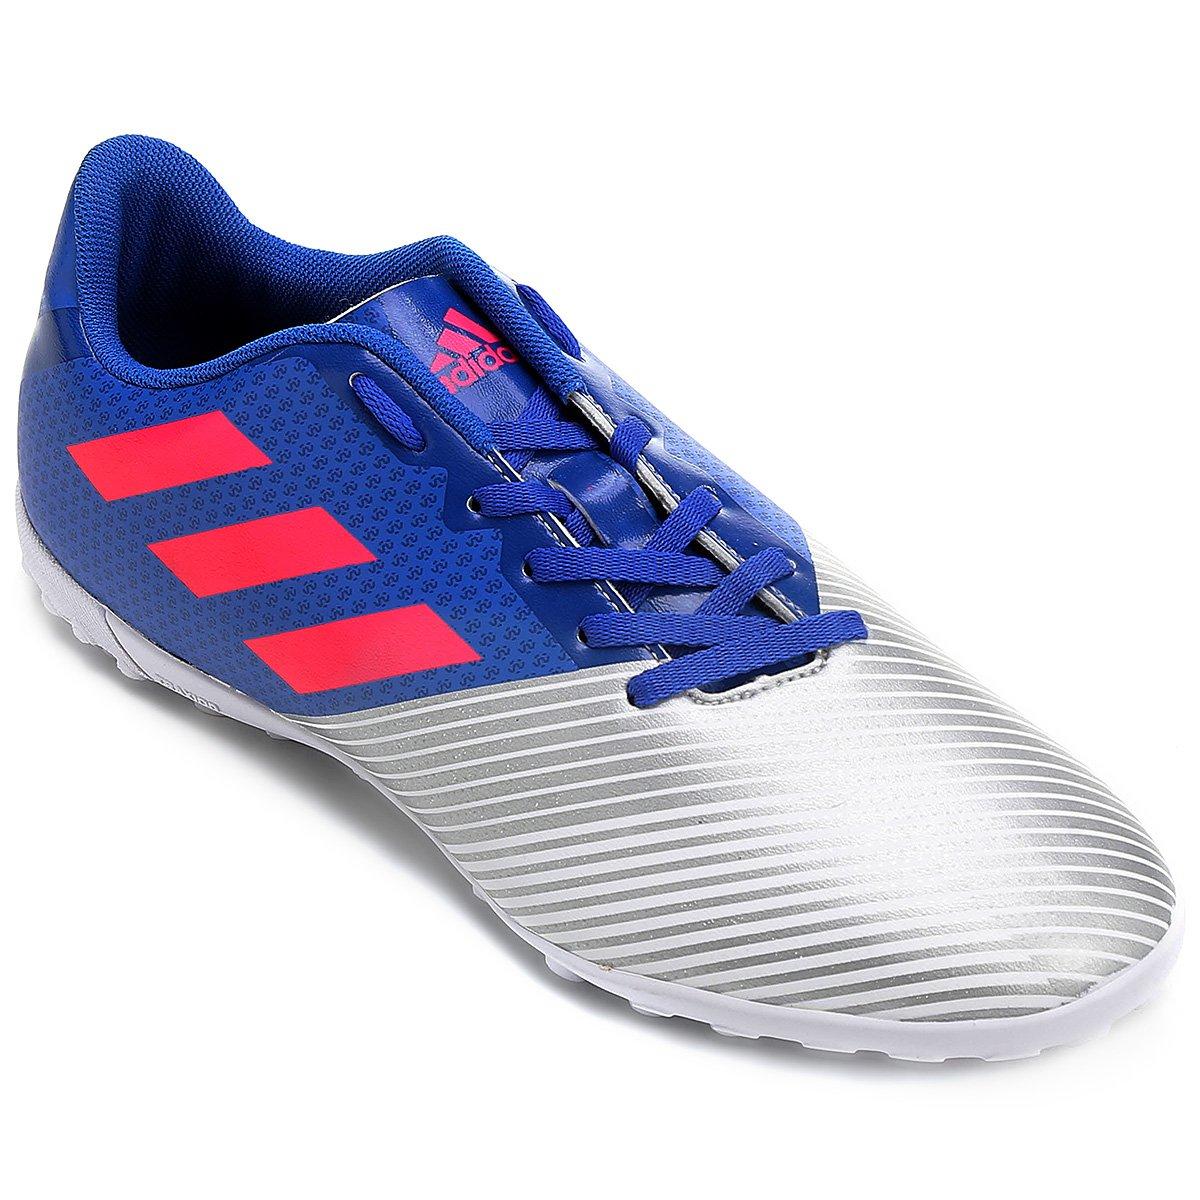 Chuteira Society Adidas Artilheira 17 TF - Azul e Prata - Compre ... 73e2ab8c7930c